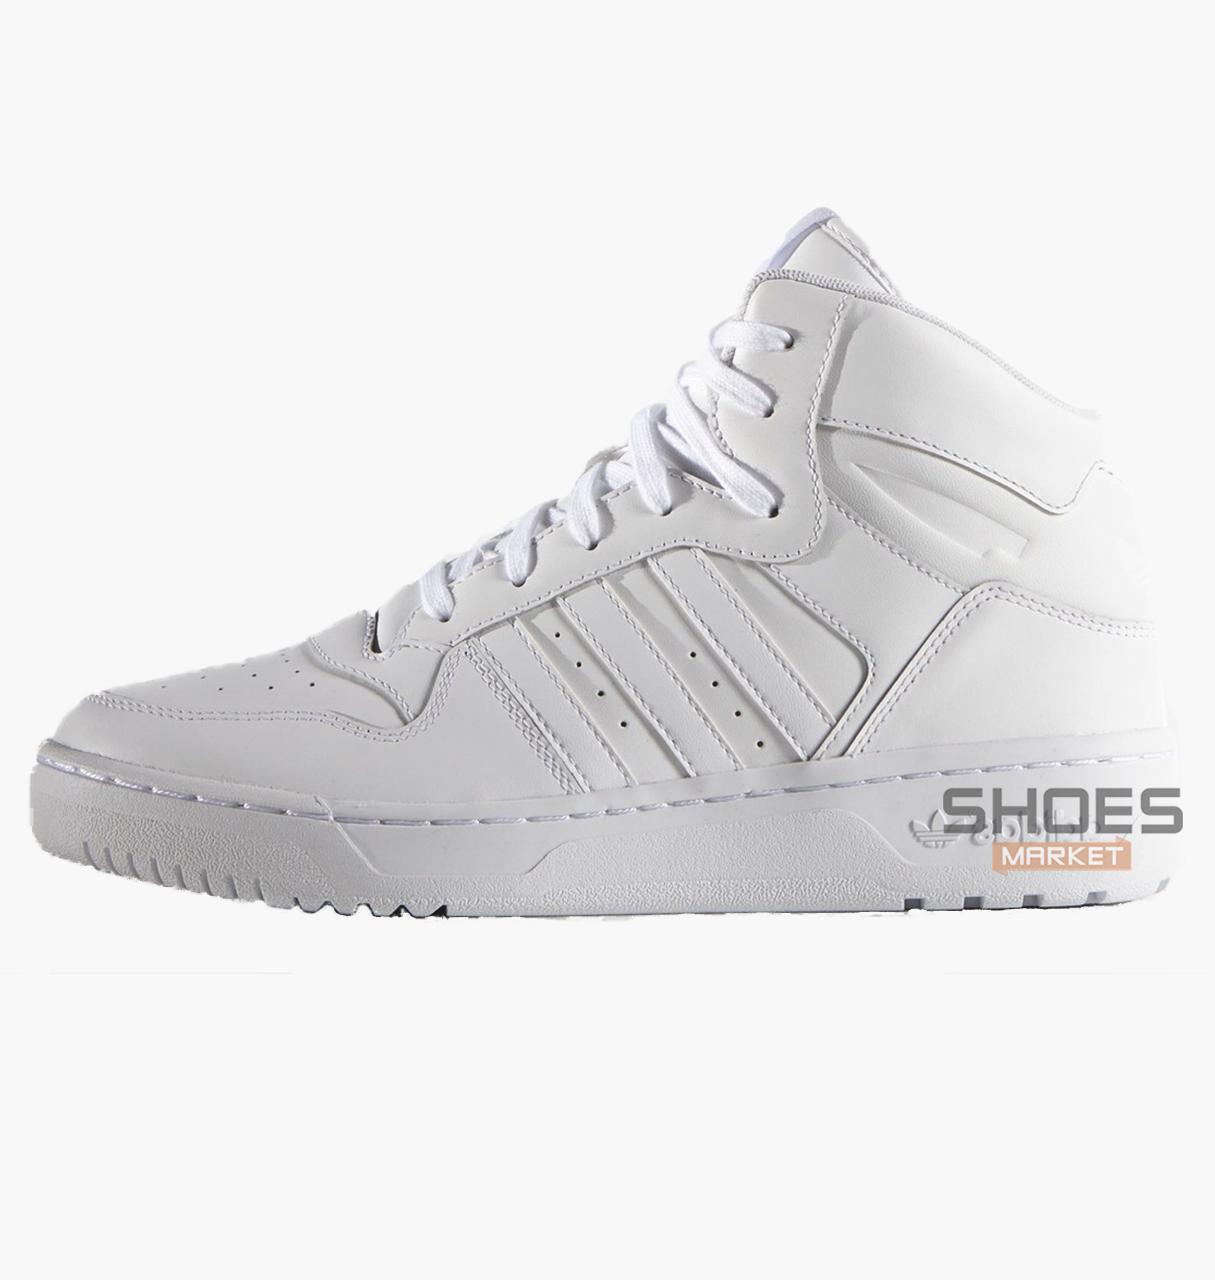 Женские кроссовки  Adidas M ATTITUDE REVIVE W  White  S75197, оригинал